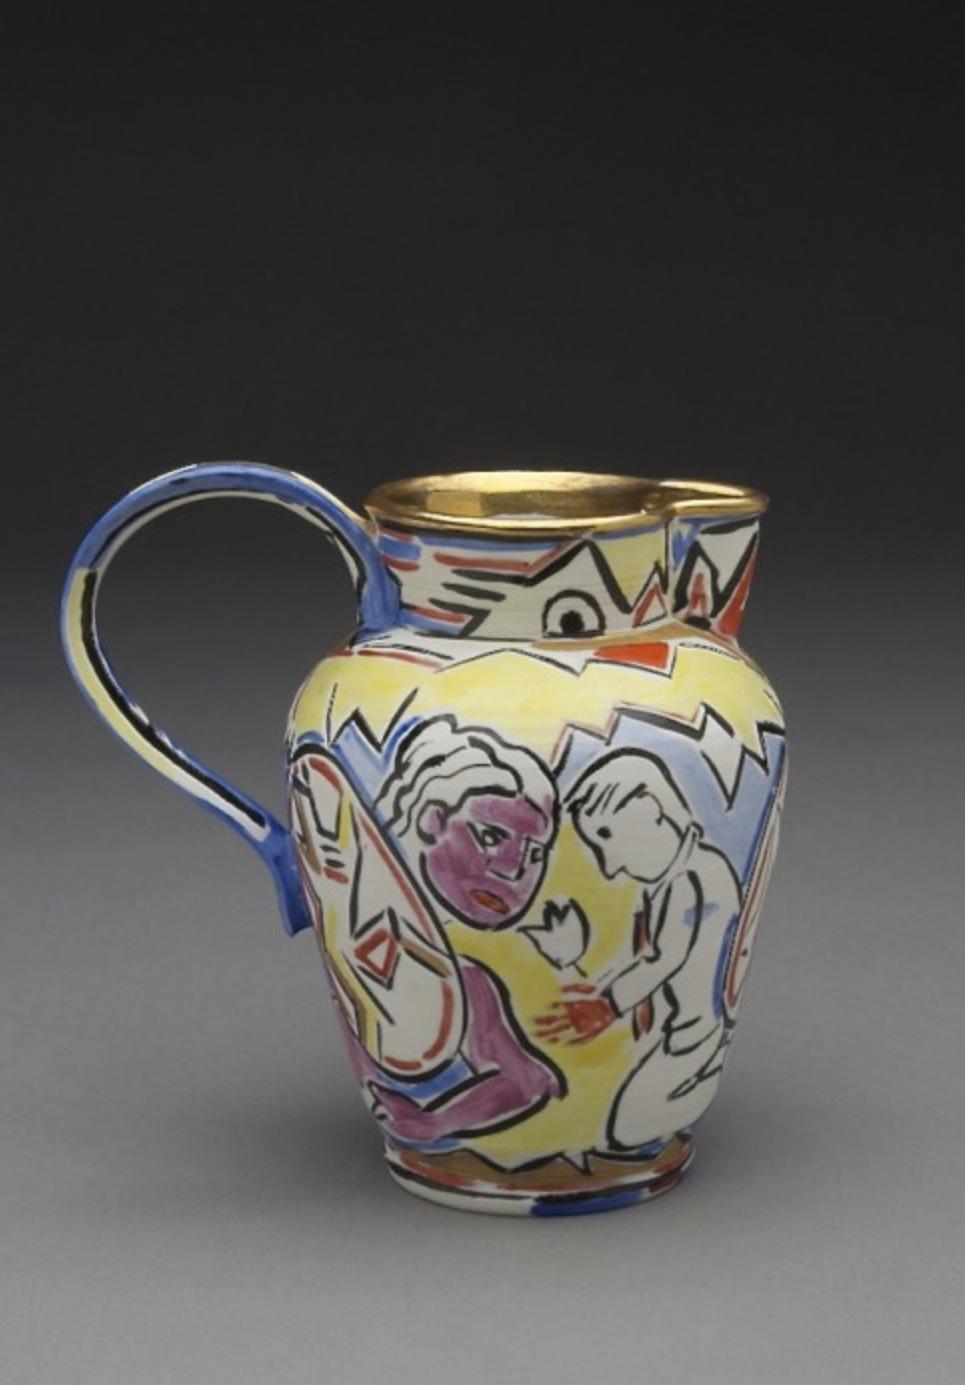 Untitled (Small Pitcher) A La Manufacture de Sevres Series, 1988 ceramic 5 × 5 × 3.5 inches